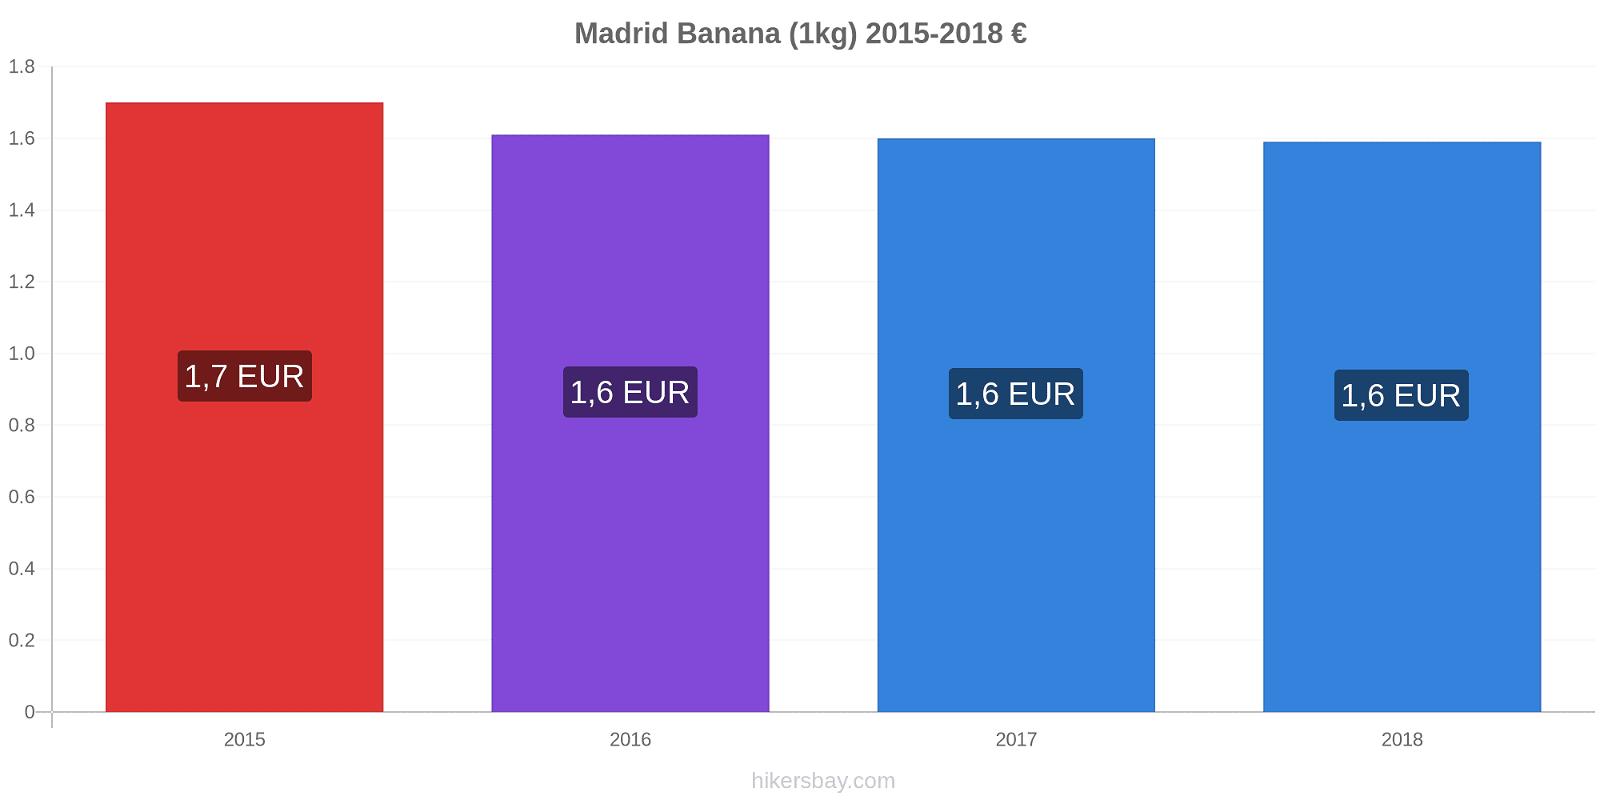 Madrid modificări de preț Banana (1kg) hikersbay.com